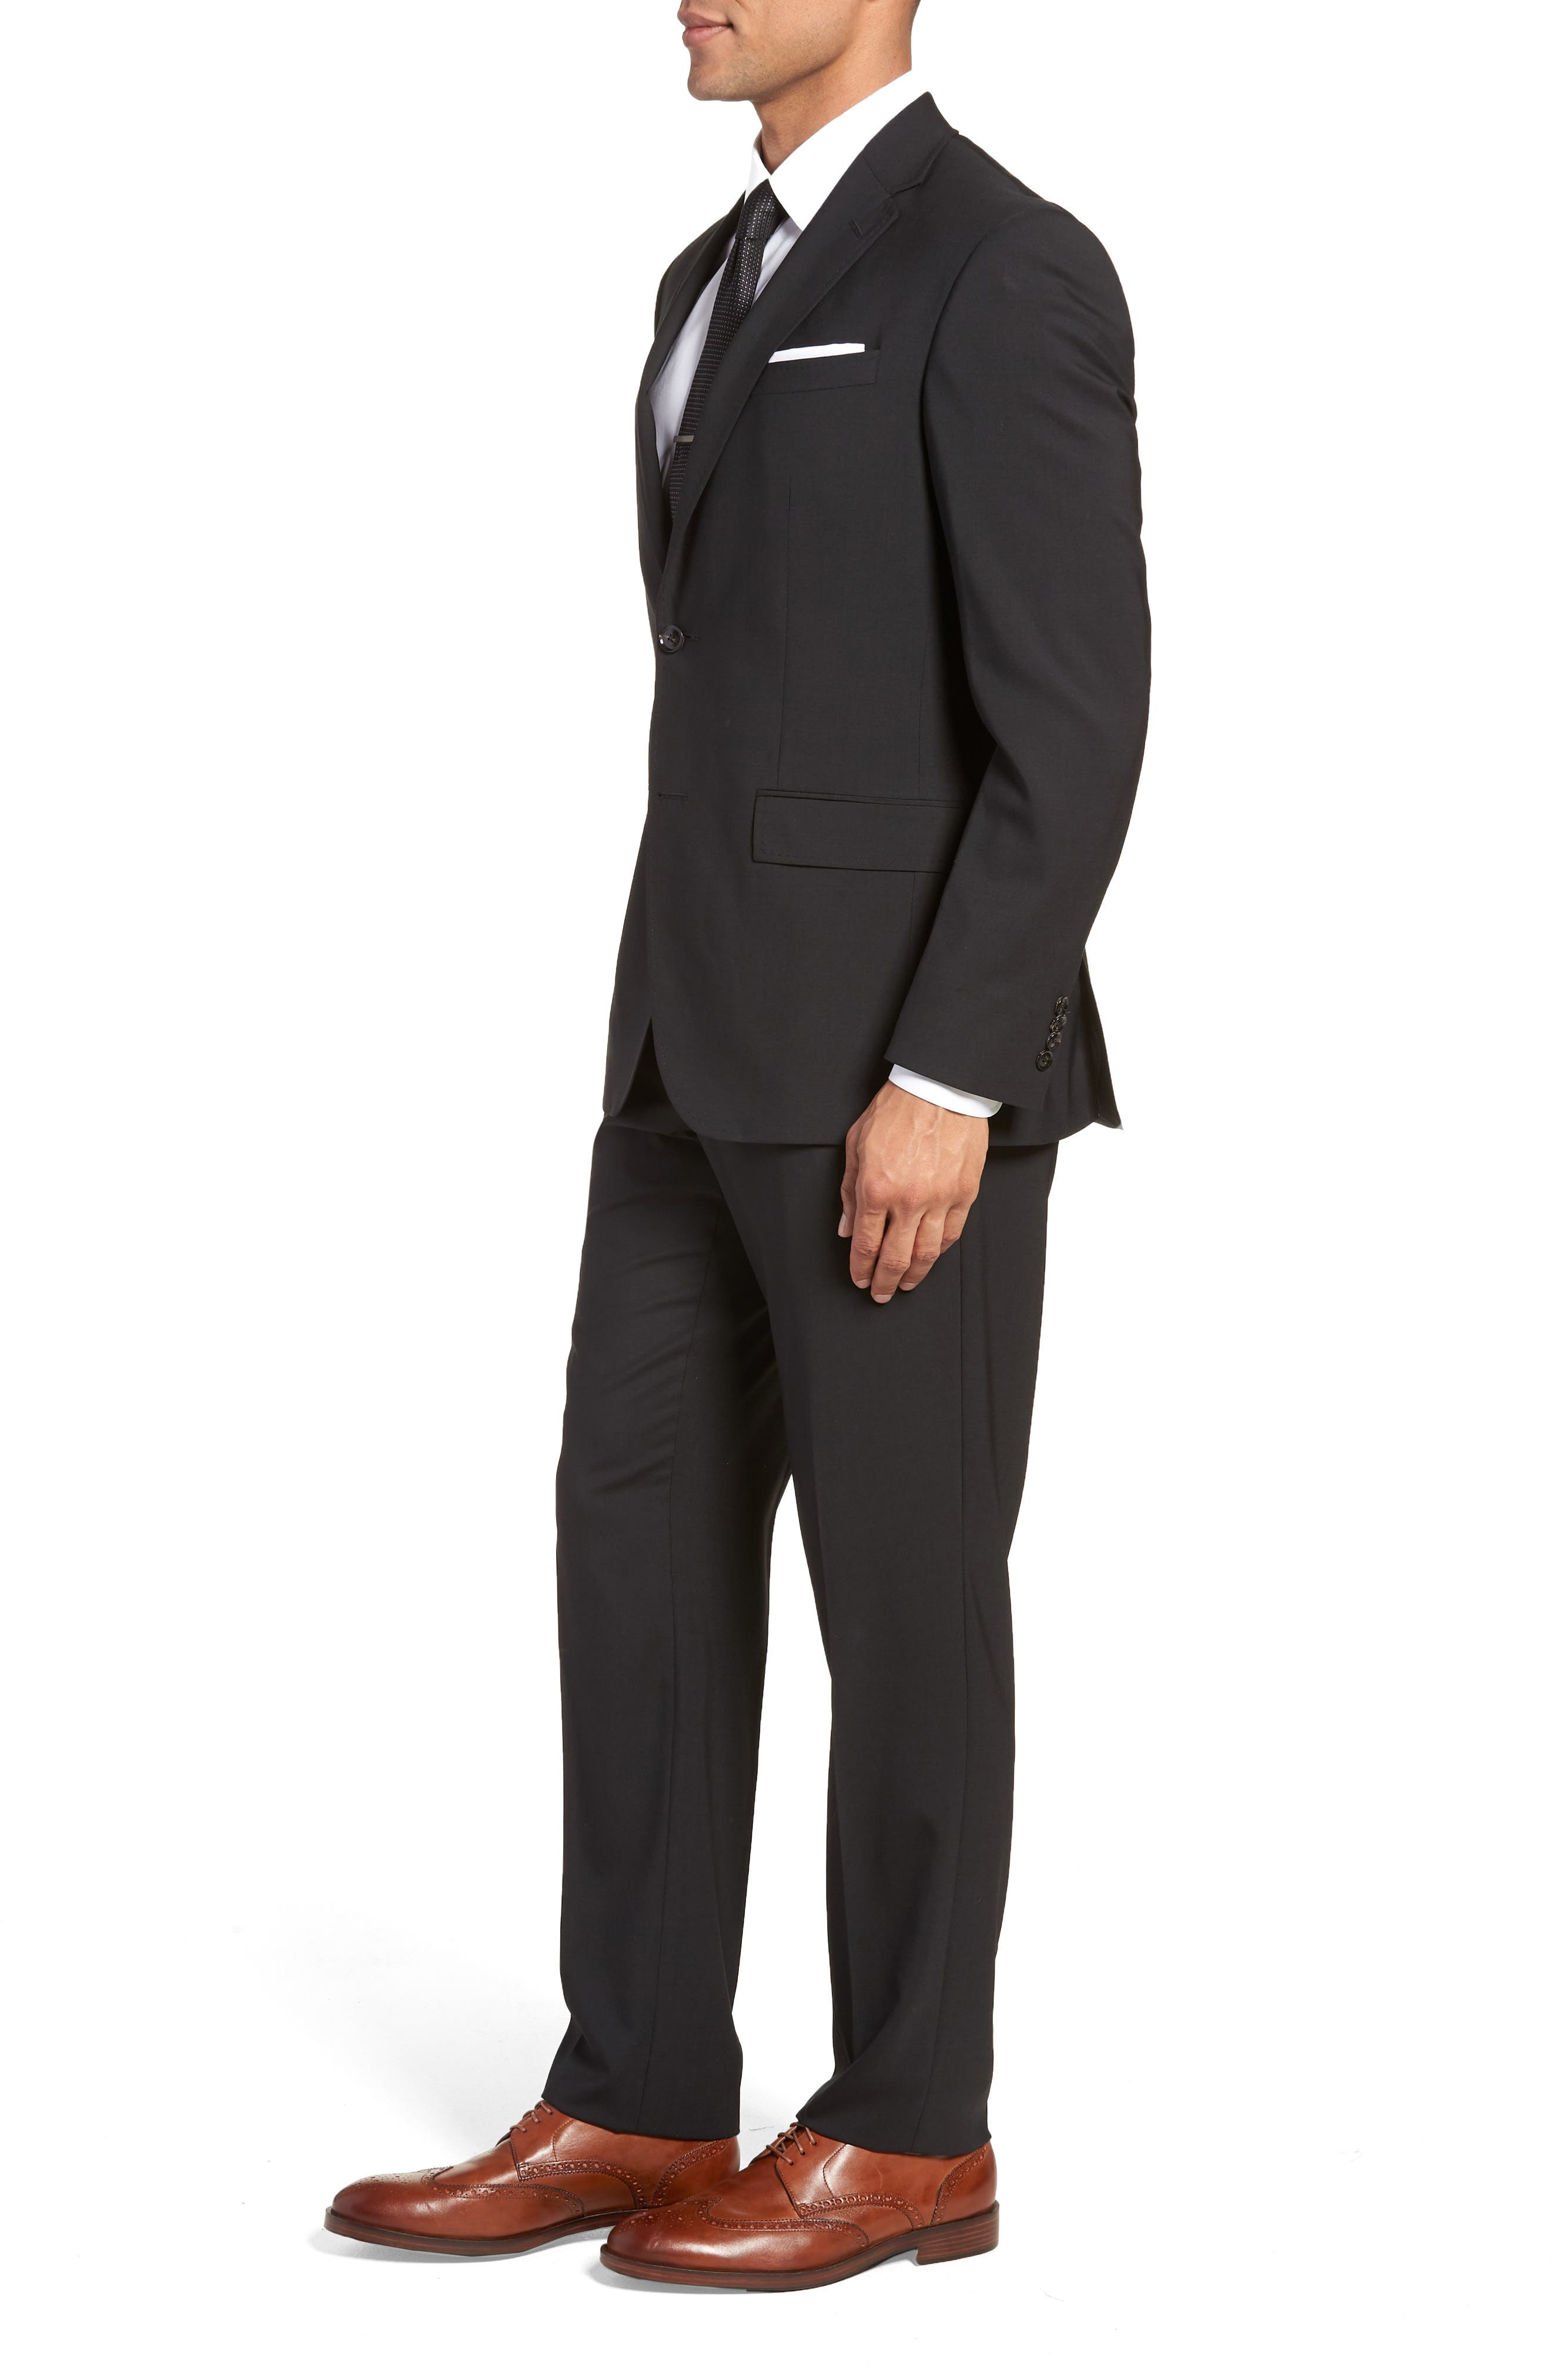 Jay Trim Fit Solid Wool Suit,                             Alternate thumbnail 3, color,                             Black